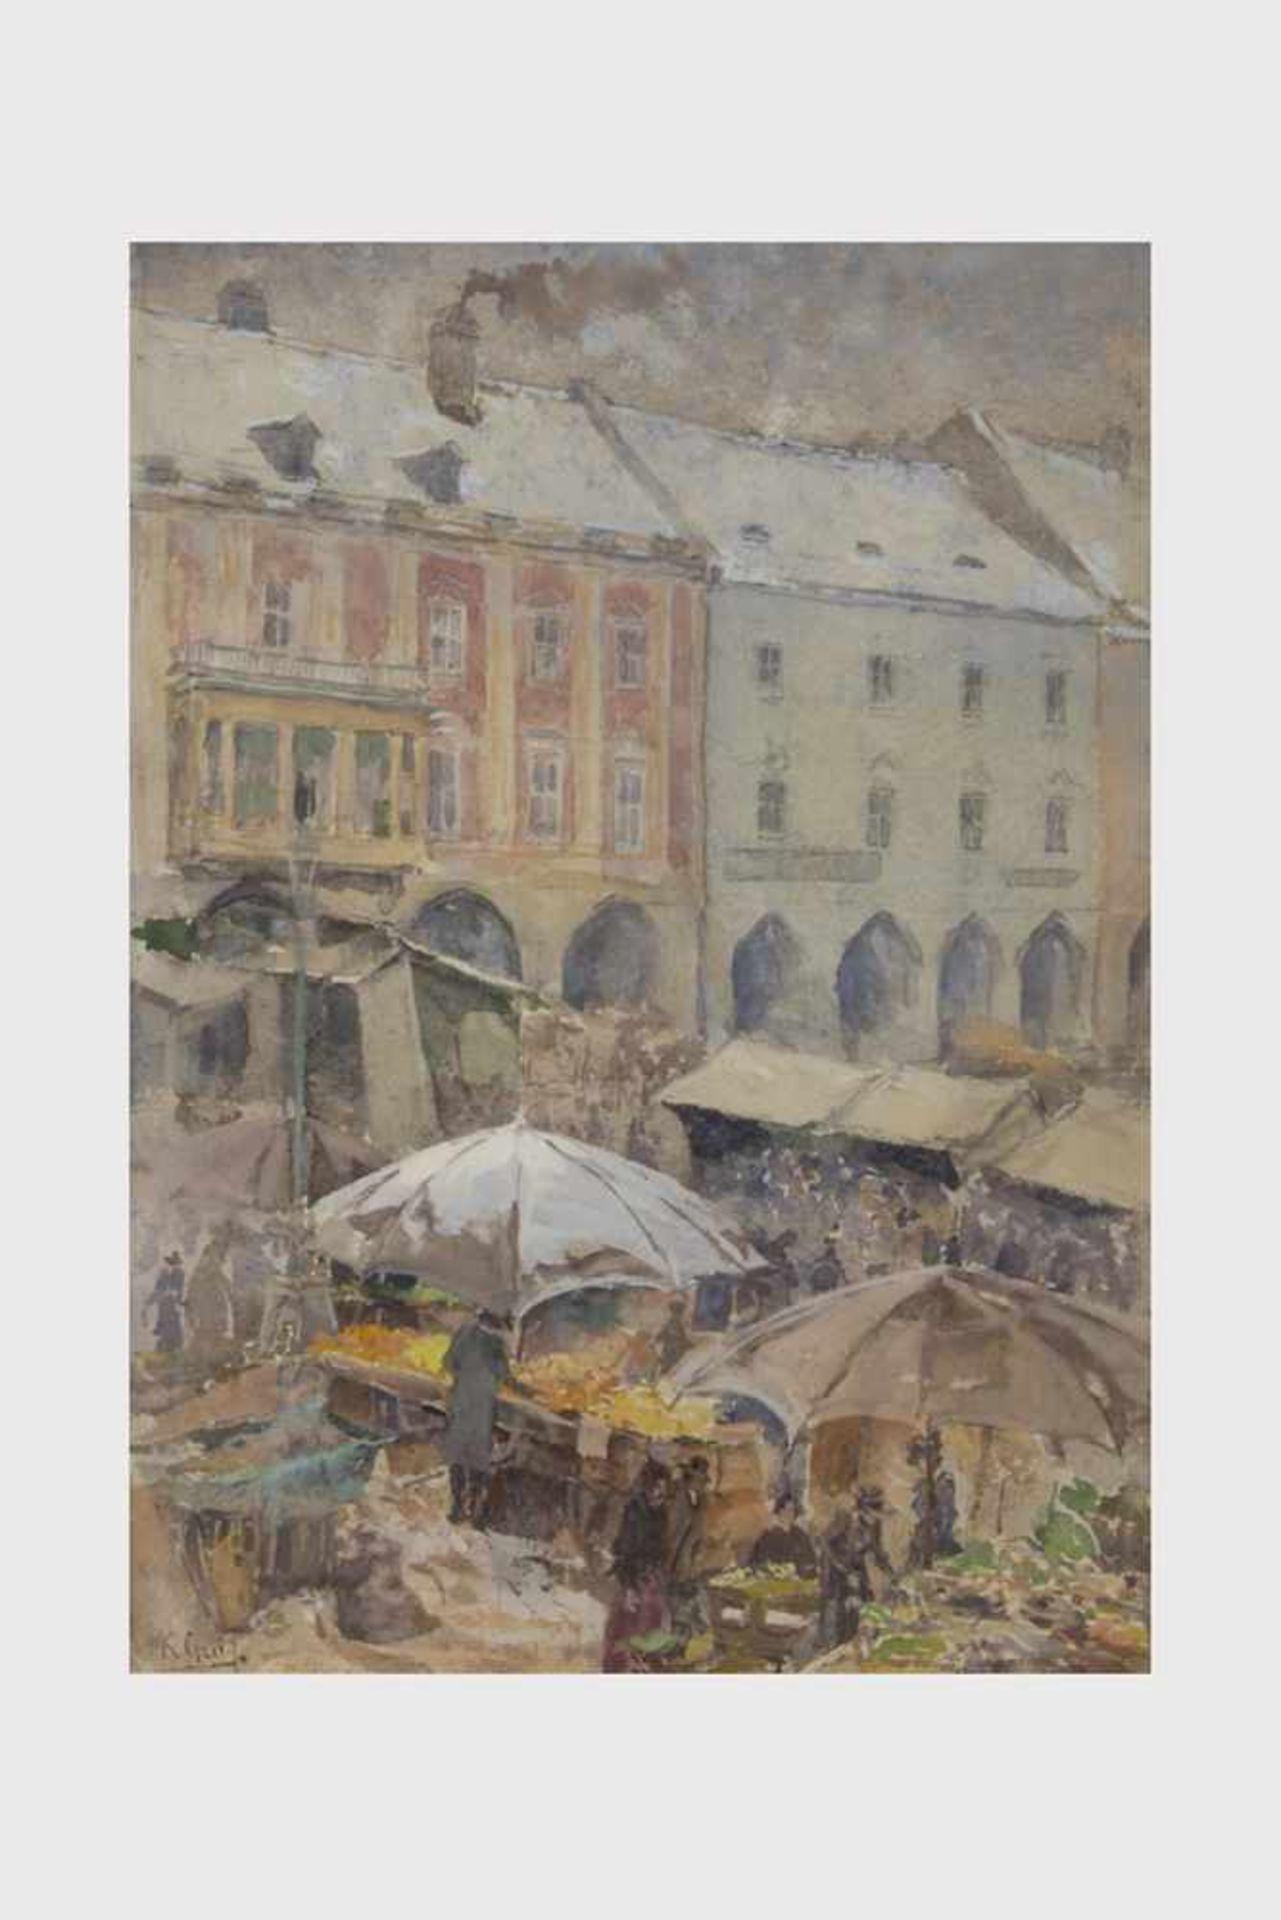 Los 12 - Karl Graf, (1859-1925), Marktplatz Wiener Neustadt, Aquarell, signiert K. Graf, 37,5x26,5, in